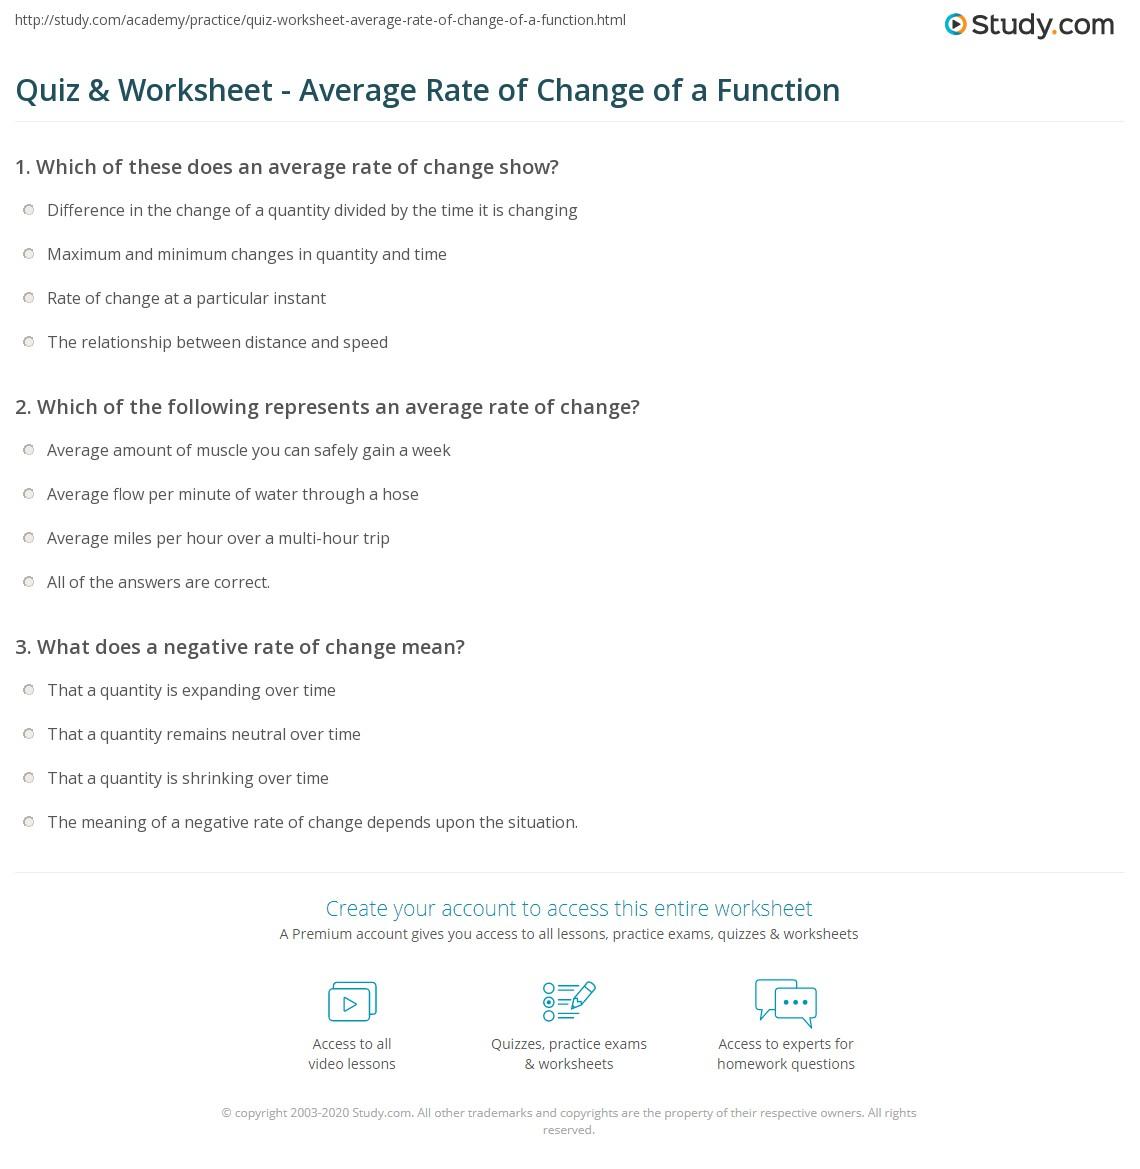 Worksheets Average Rate Of Change Worksheet quiz worksheet average rate of change a function study com print calculating interpreting functions worksheet